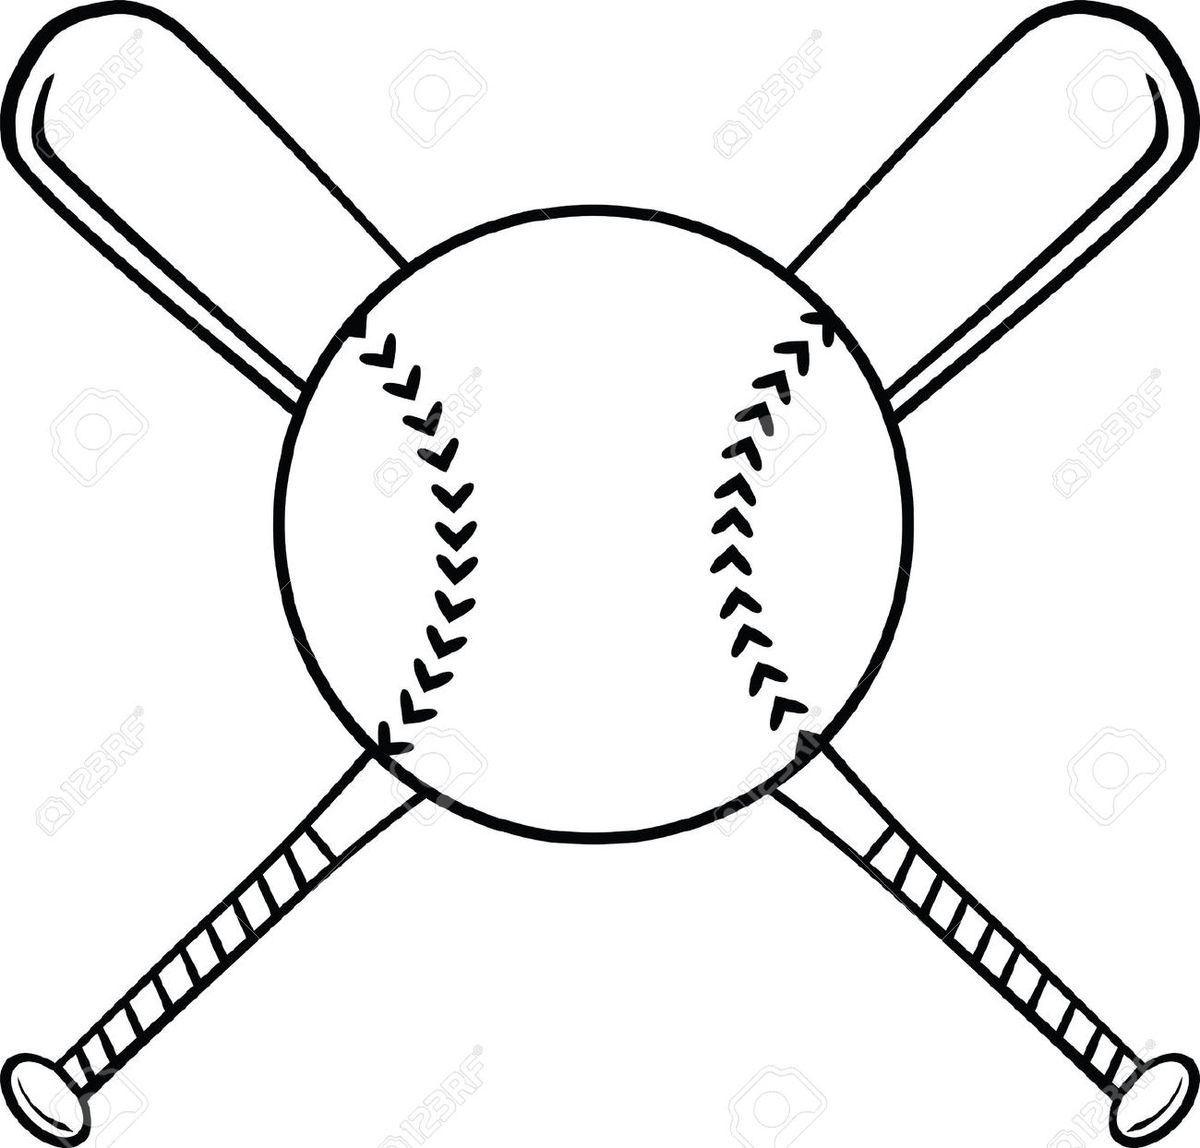 photograph about Baseball Bat Template Printable identify Pin via Ella Keto upon pointseta Baseball bat drawing